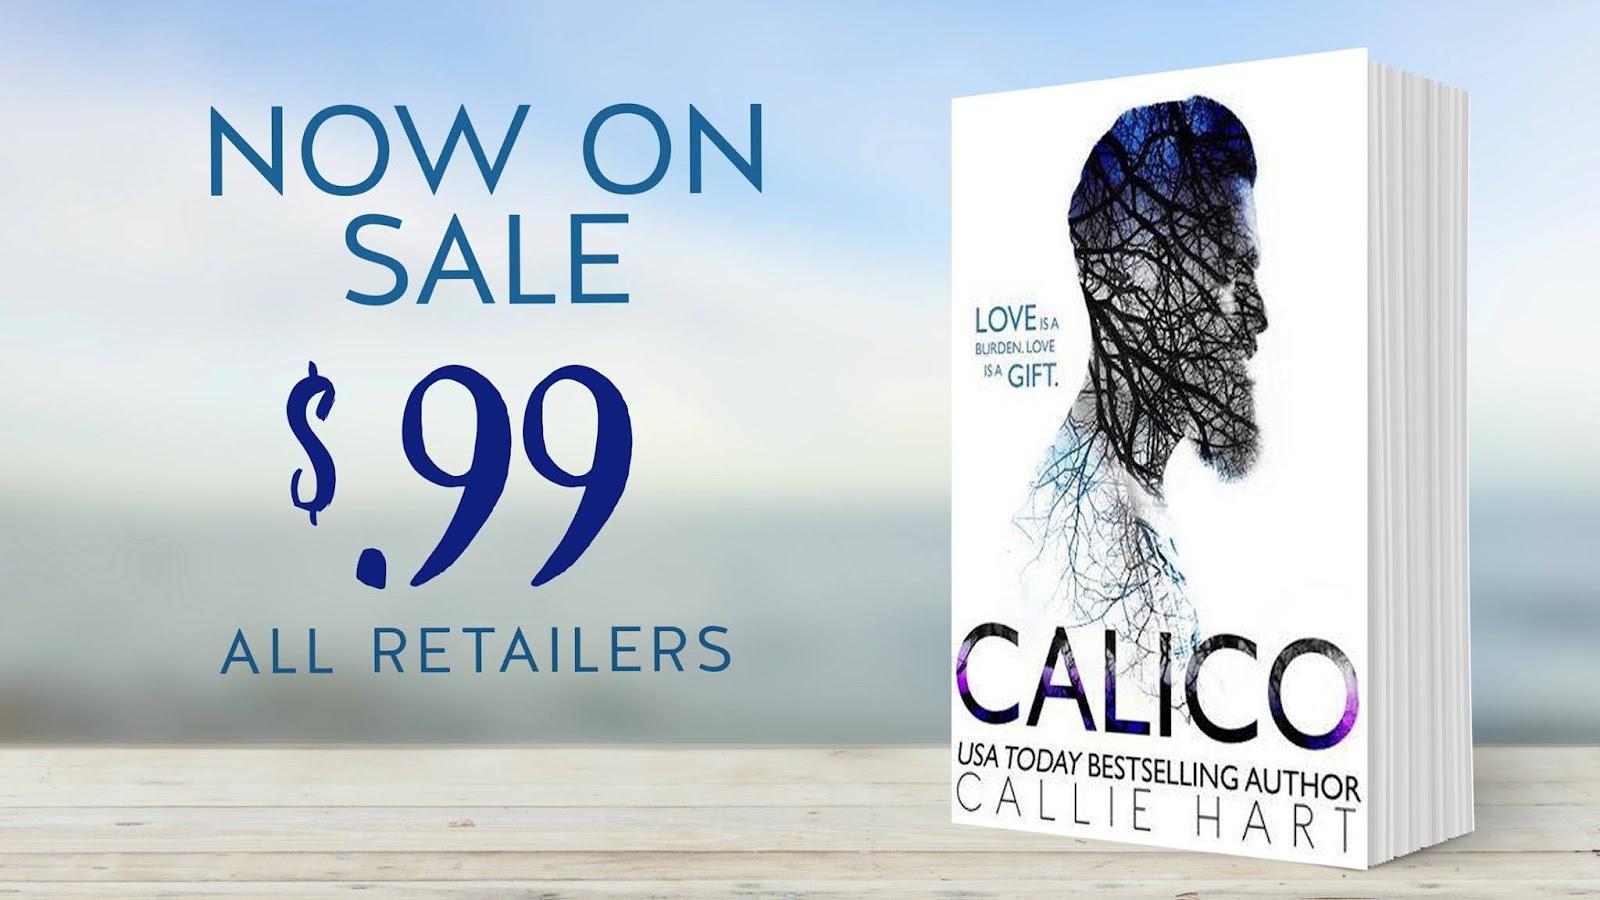 calico by callie hart sale.jpg